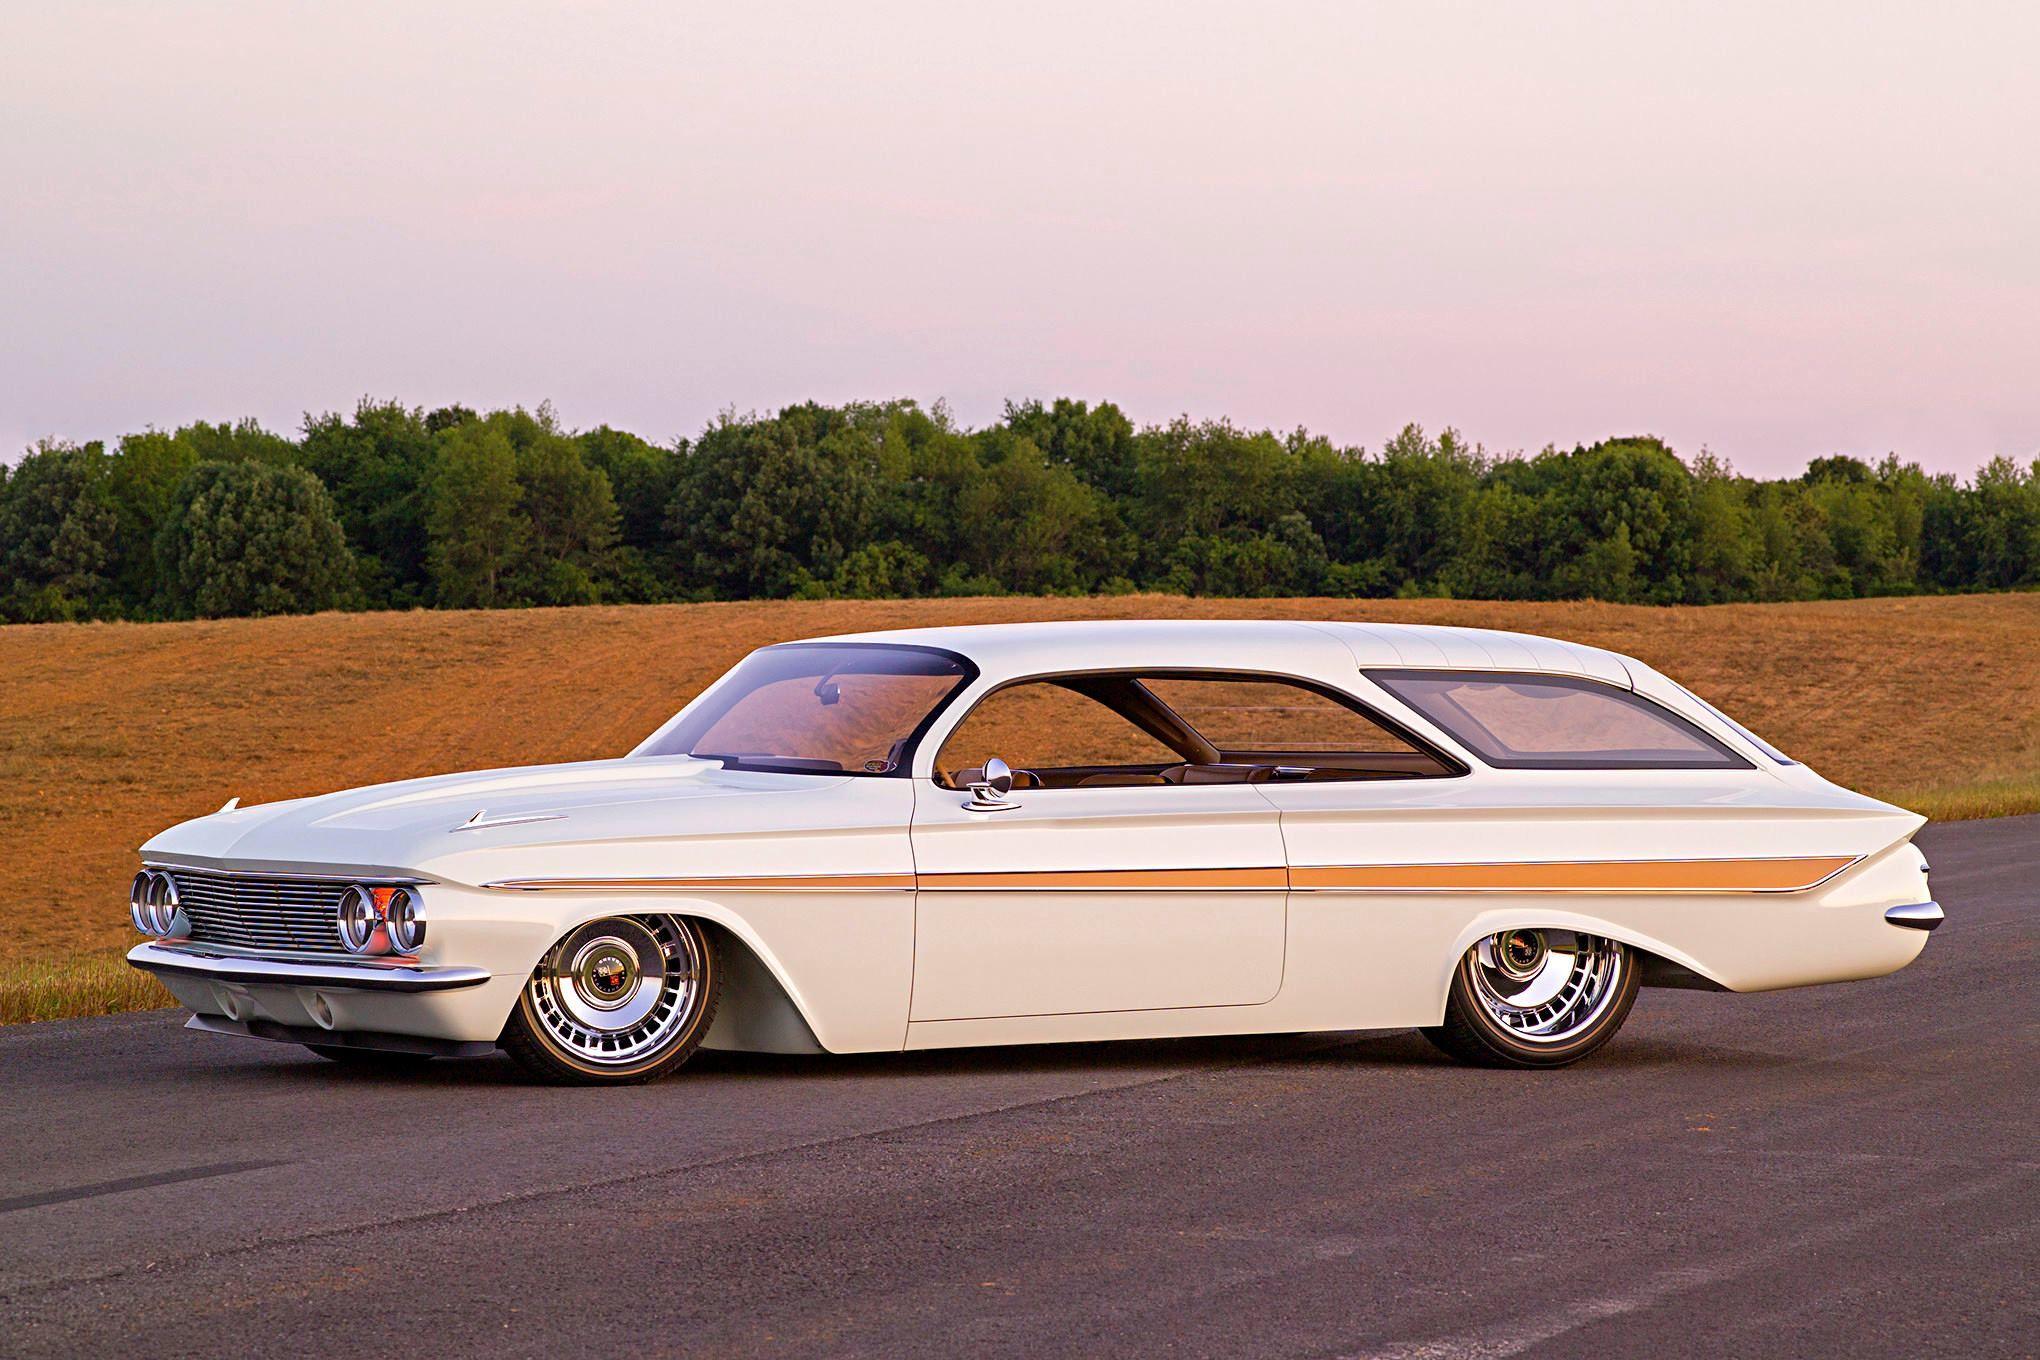 1961 Custom Chevrolet Impala Bubbletop Wagon the Double Bubble